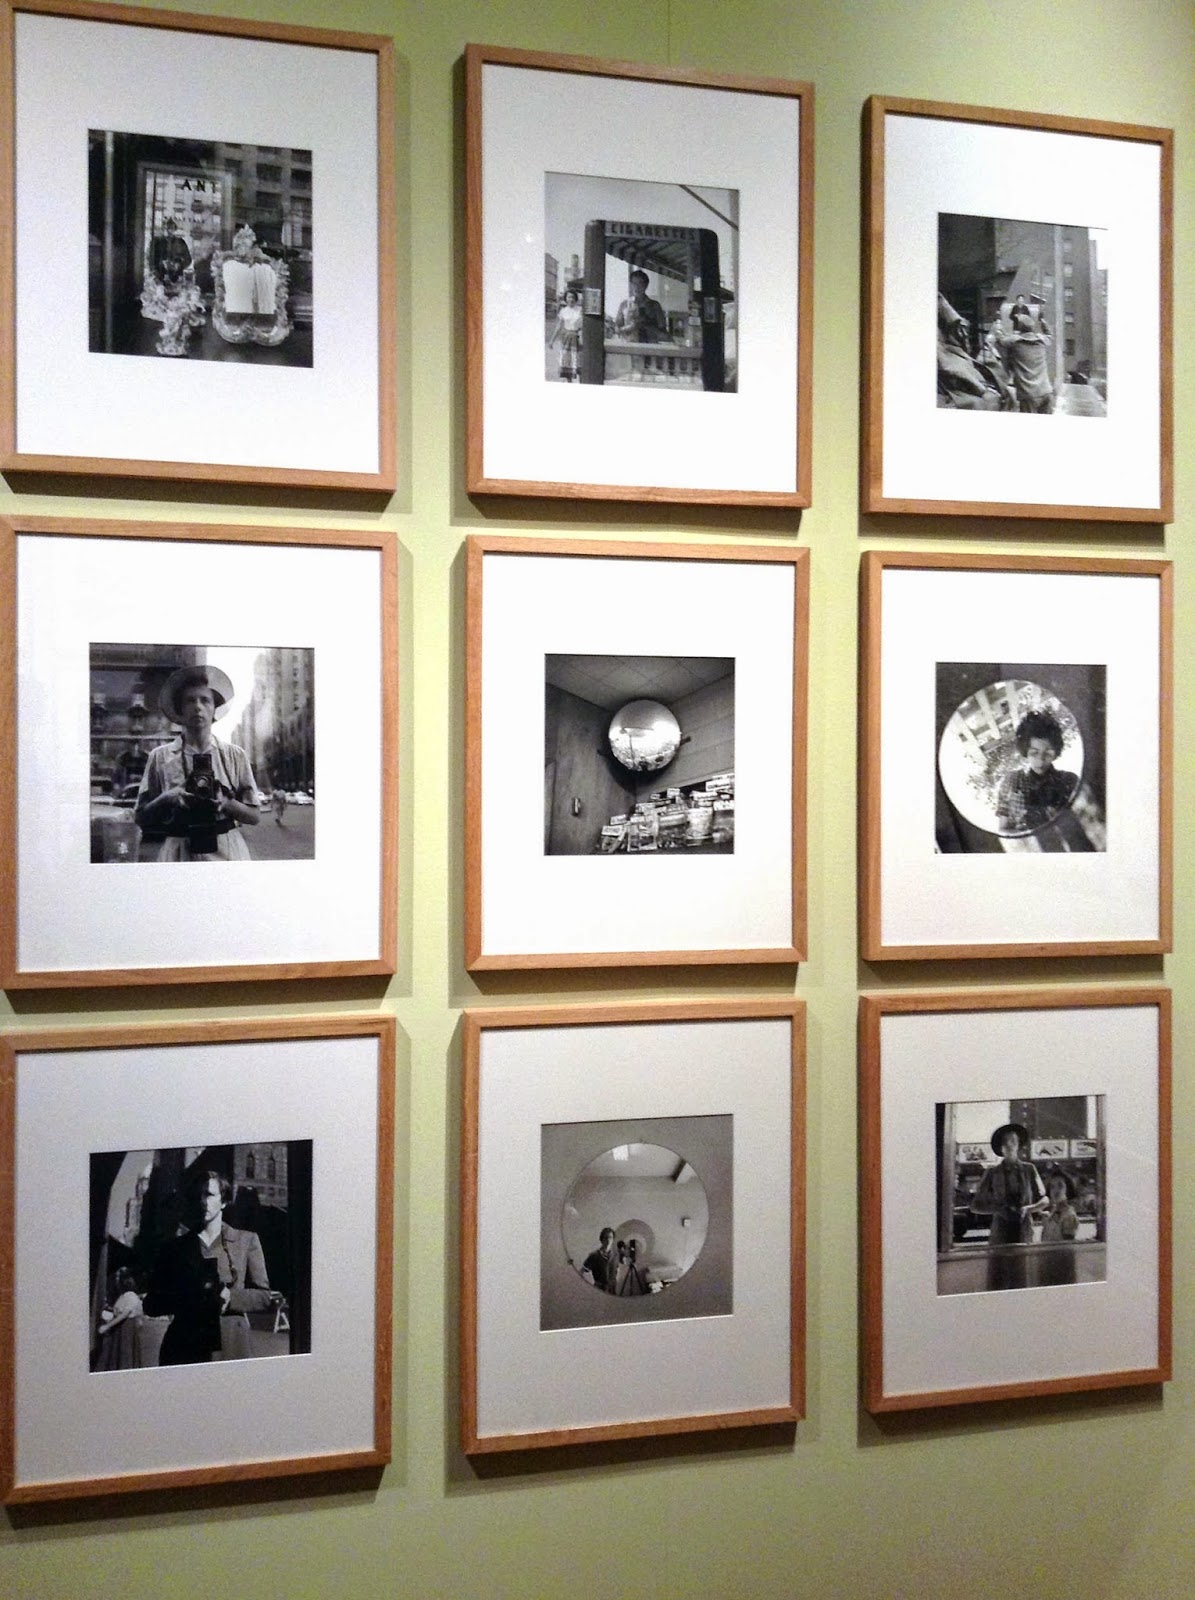 9 self portraits of Vivian Maier